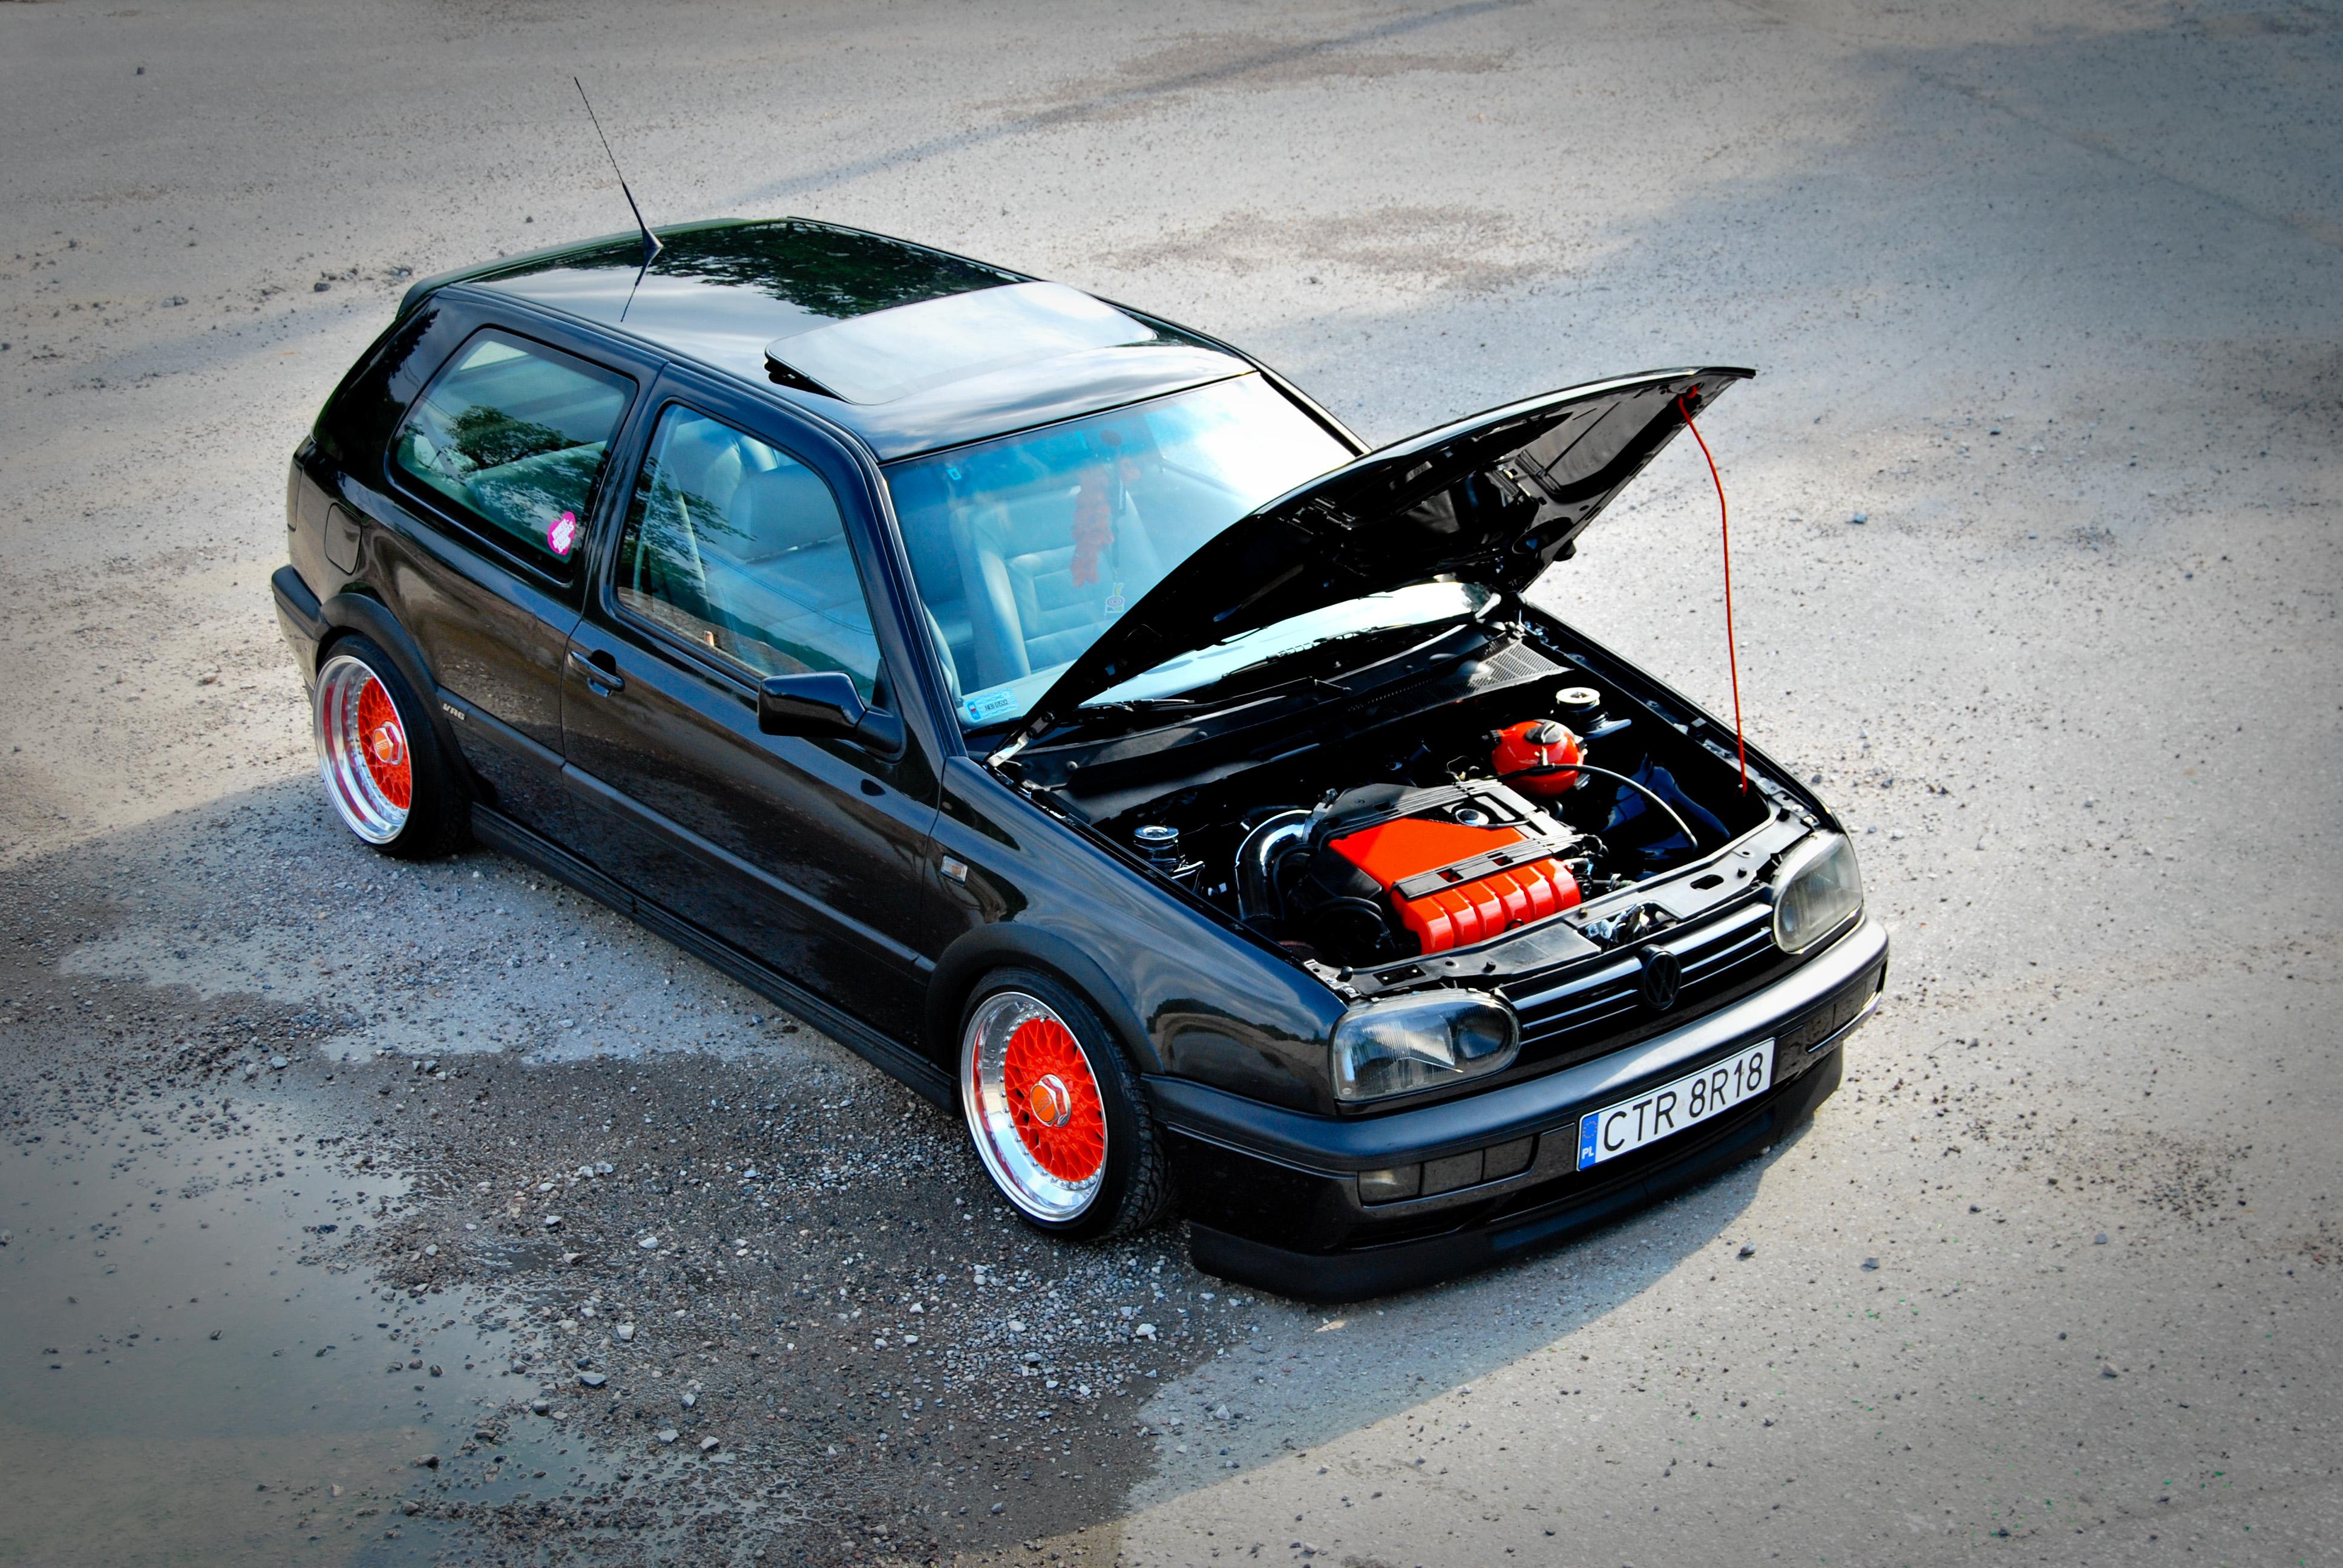 cars Poland Volkswagen black cars VDub german cars 3872x2592